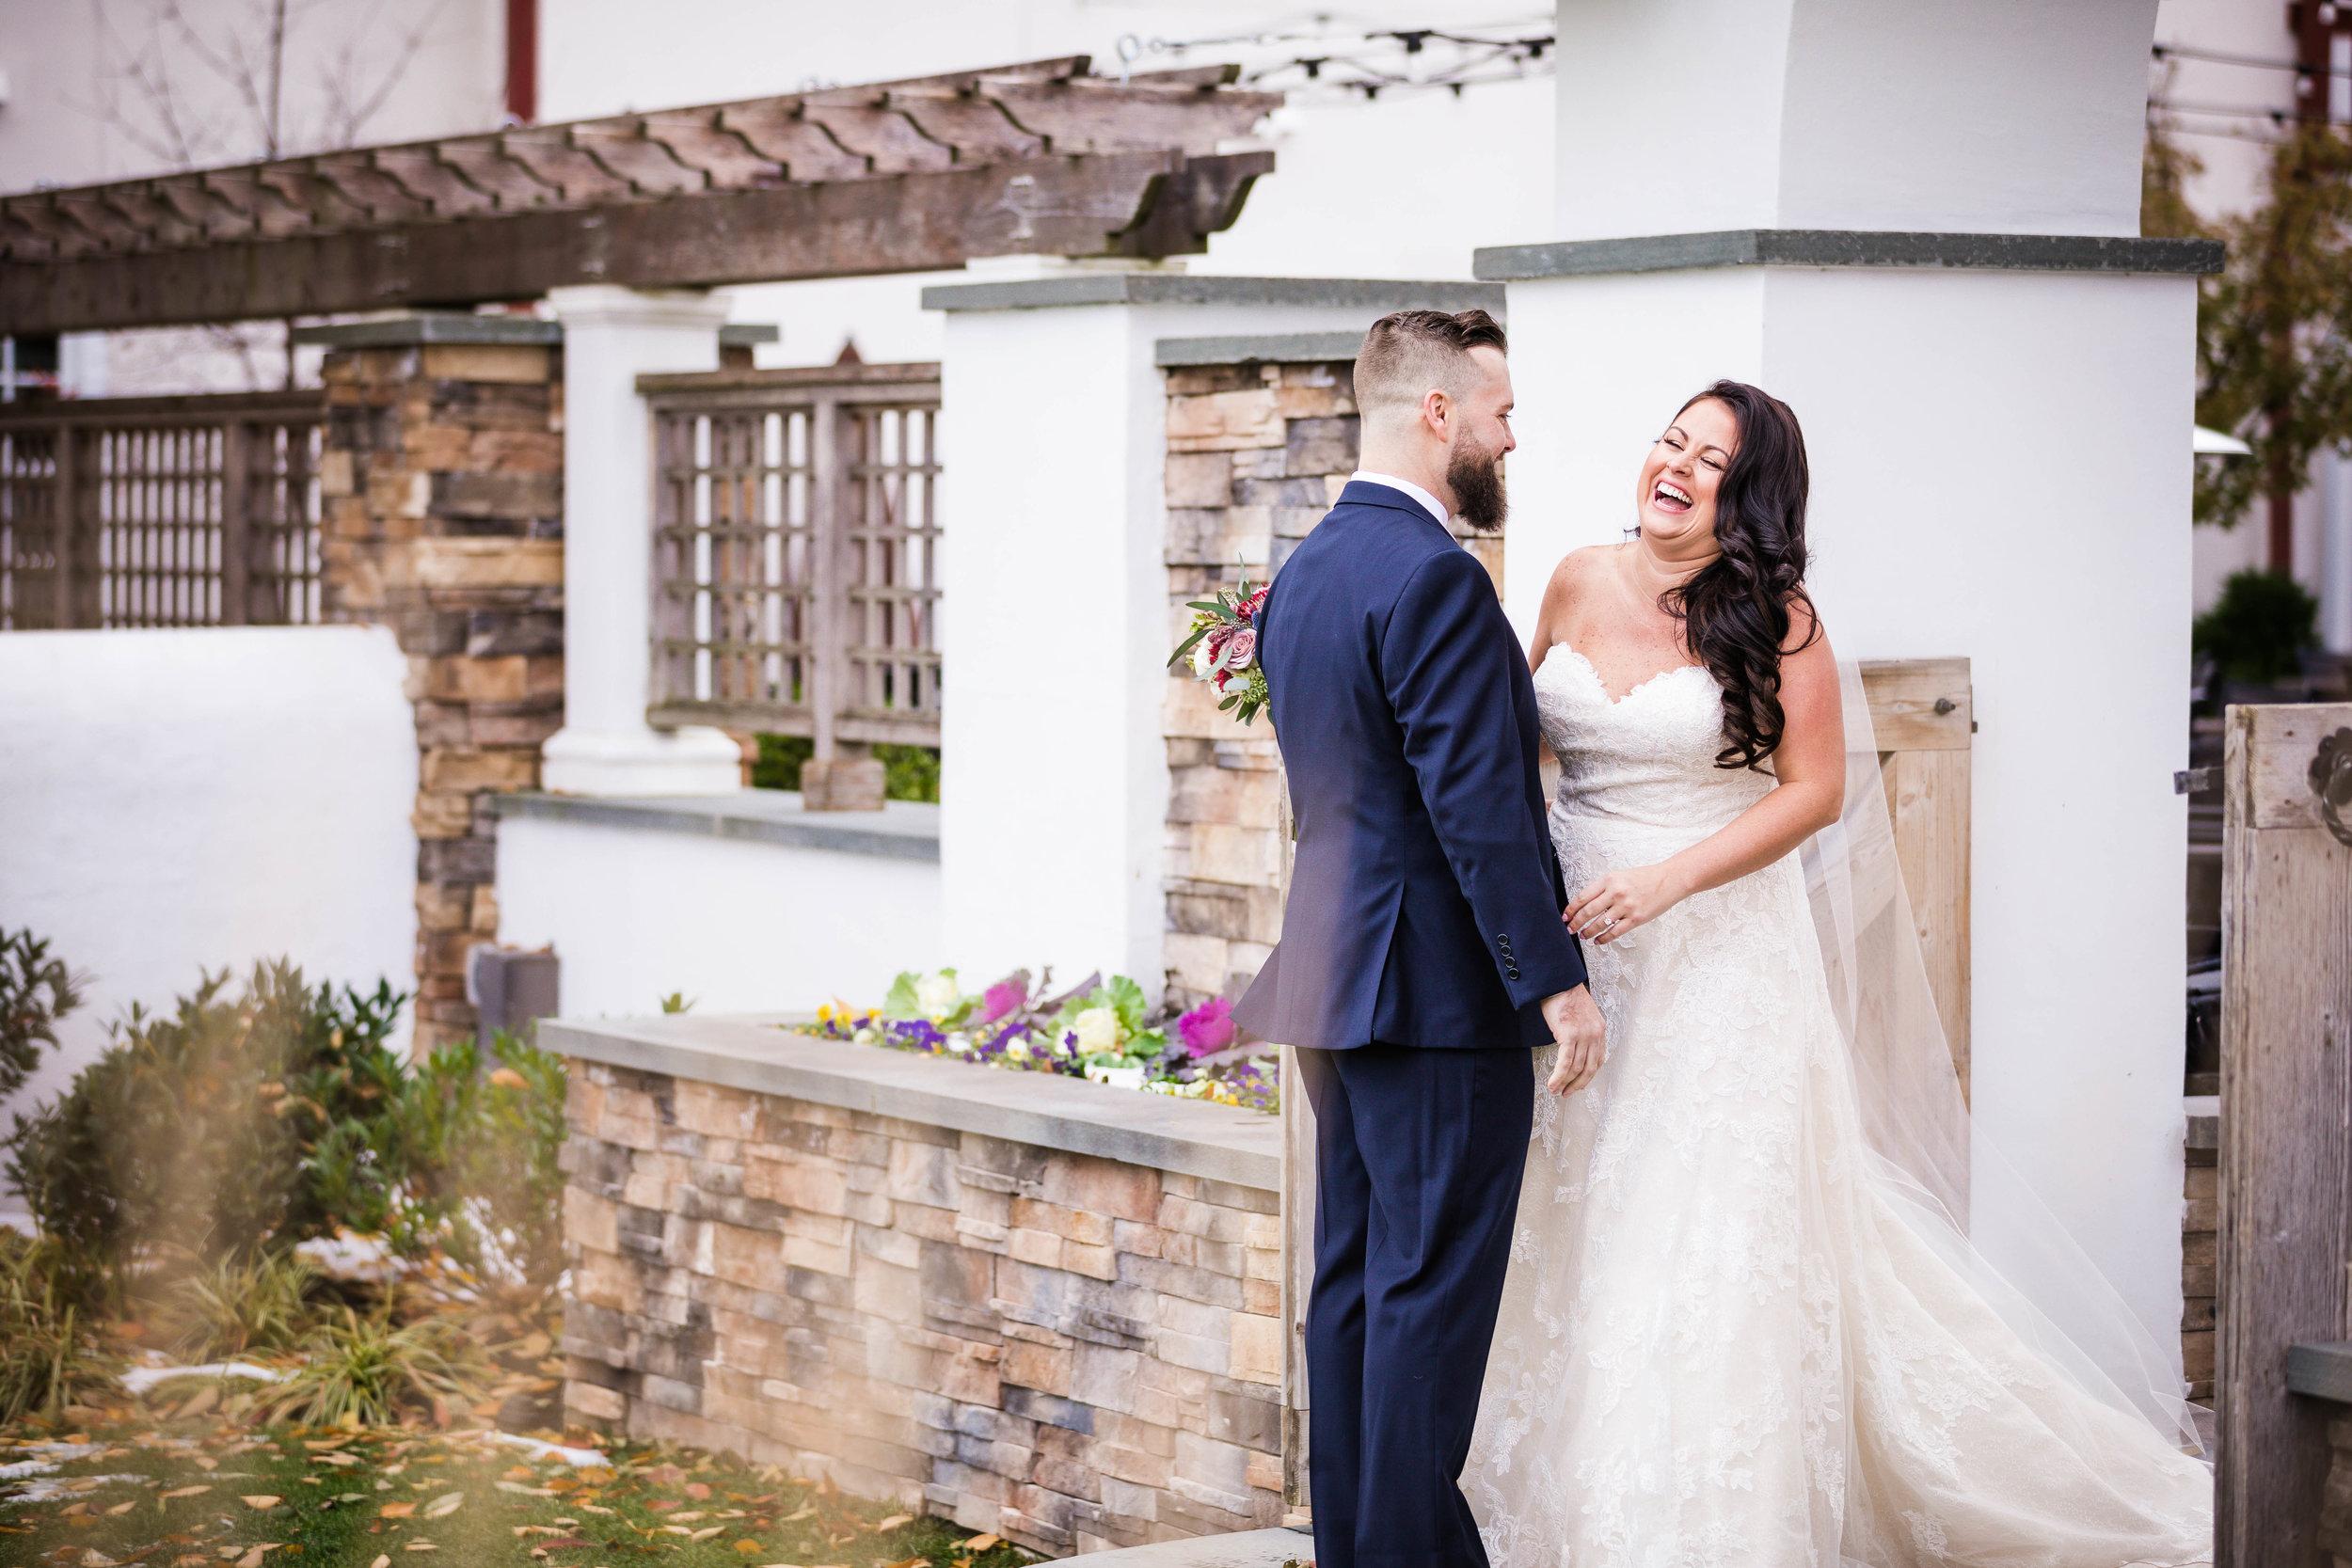 Diana and Henry - Normandy Farms Wedding Photography - Estras-48.jpg